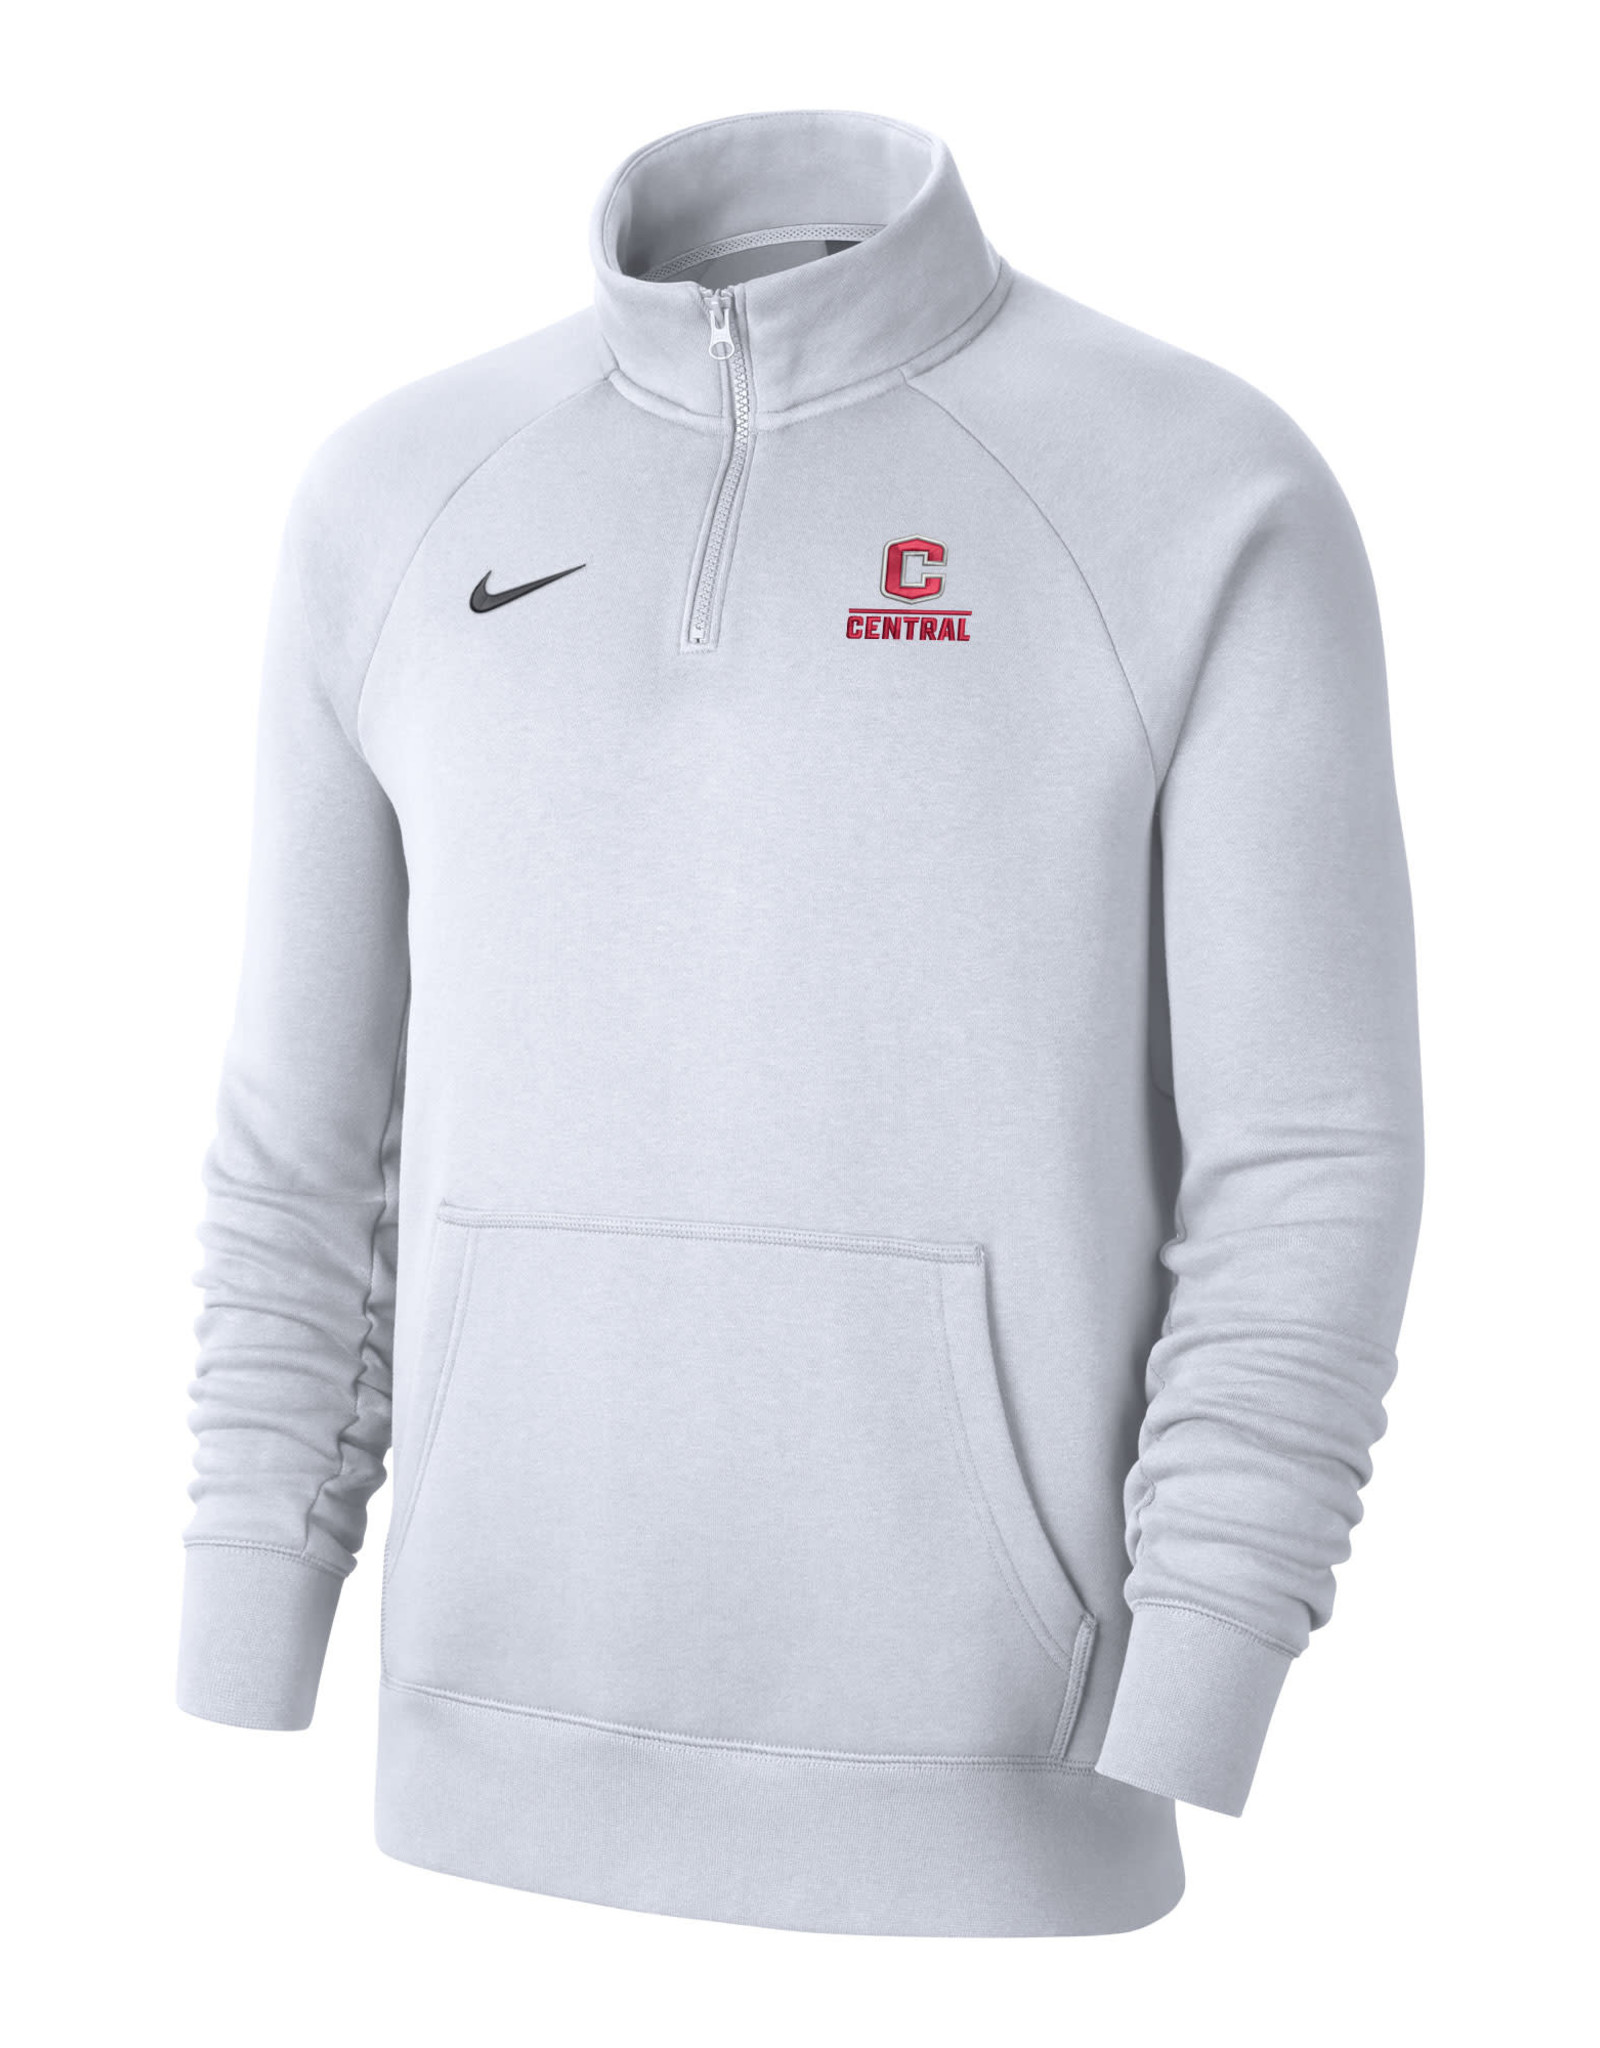 Nike Nike Club Fleece 1/4 Zip Heather White